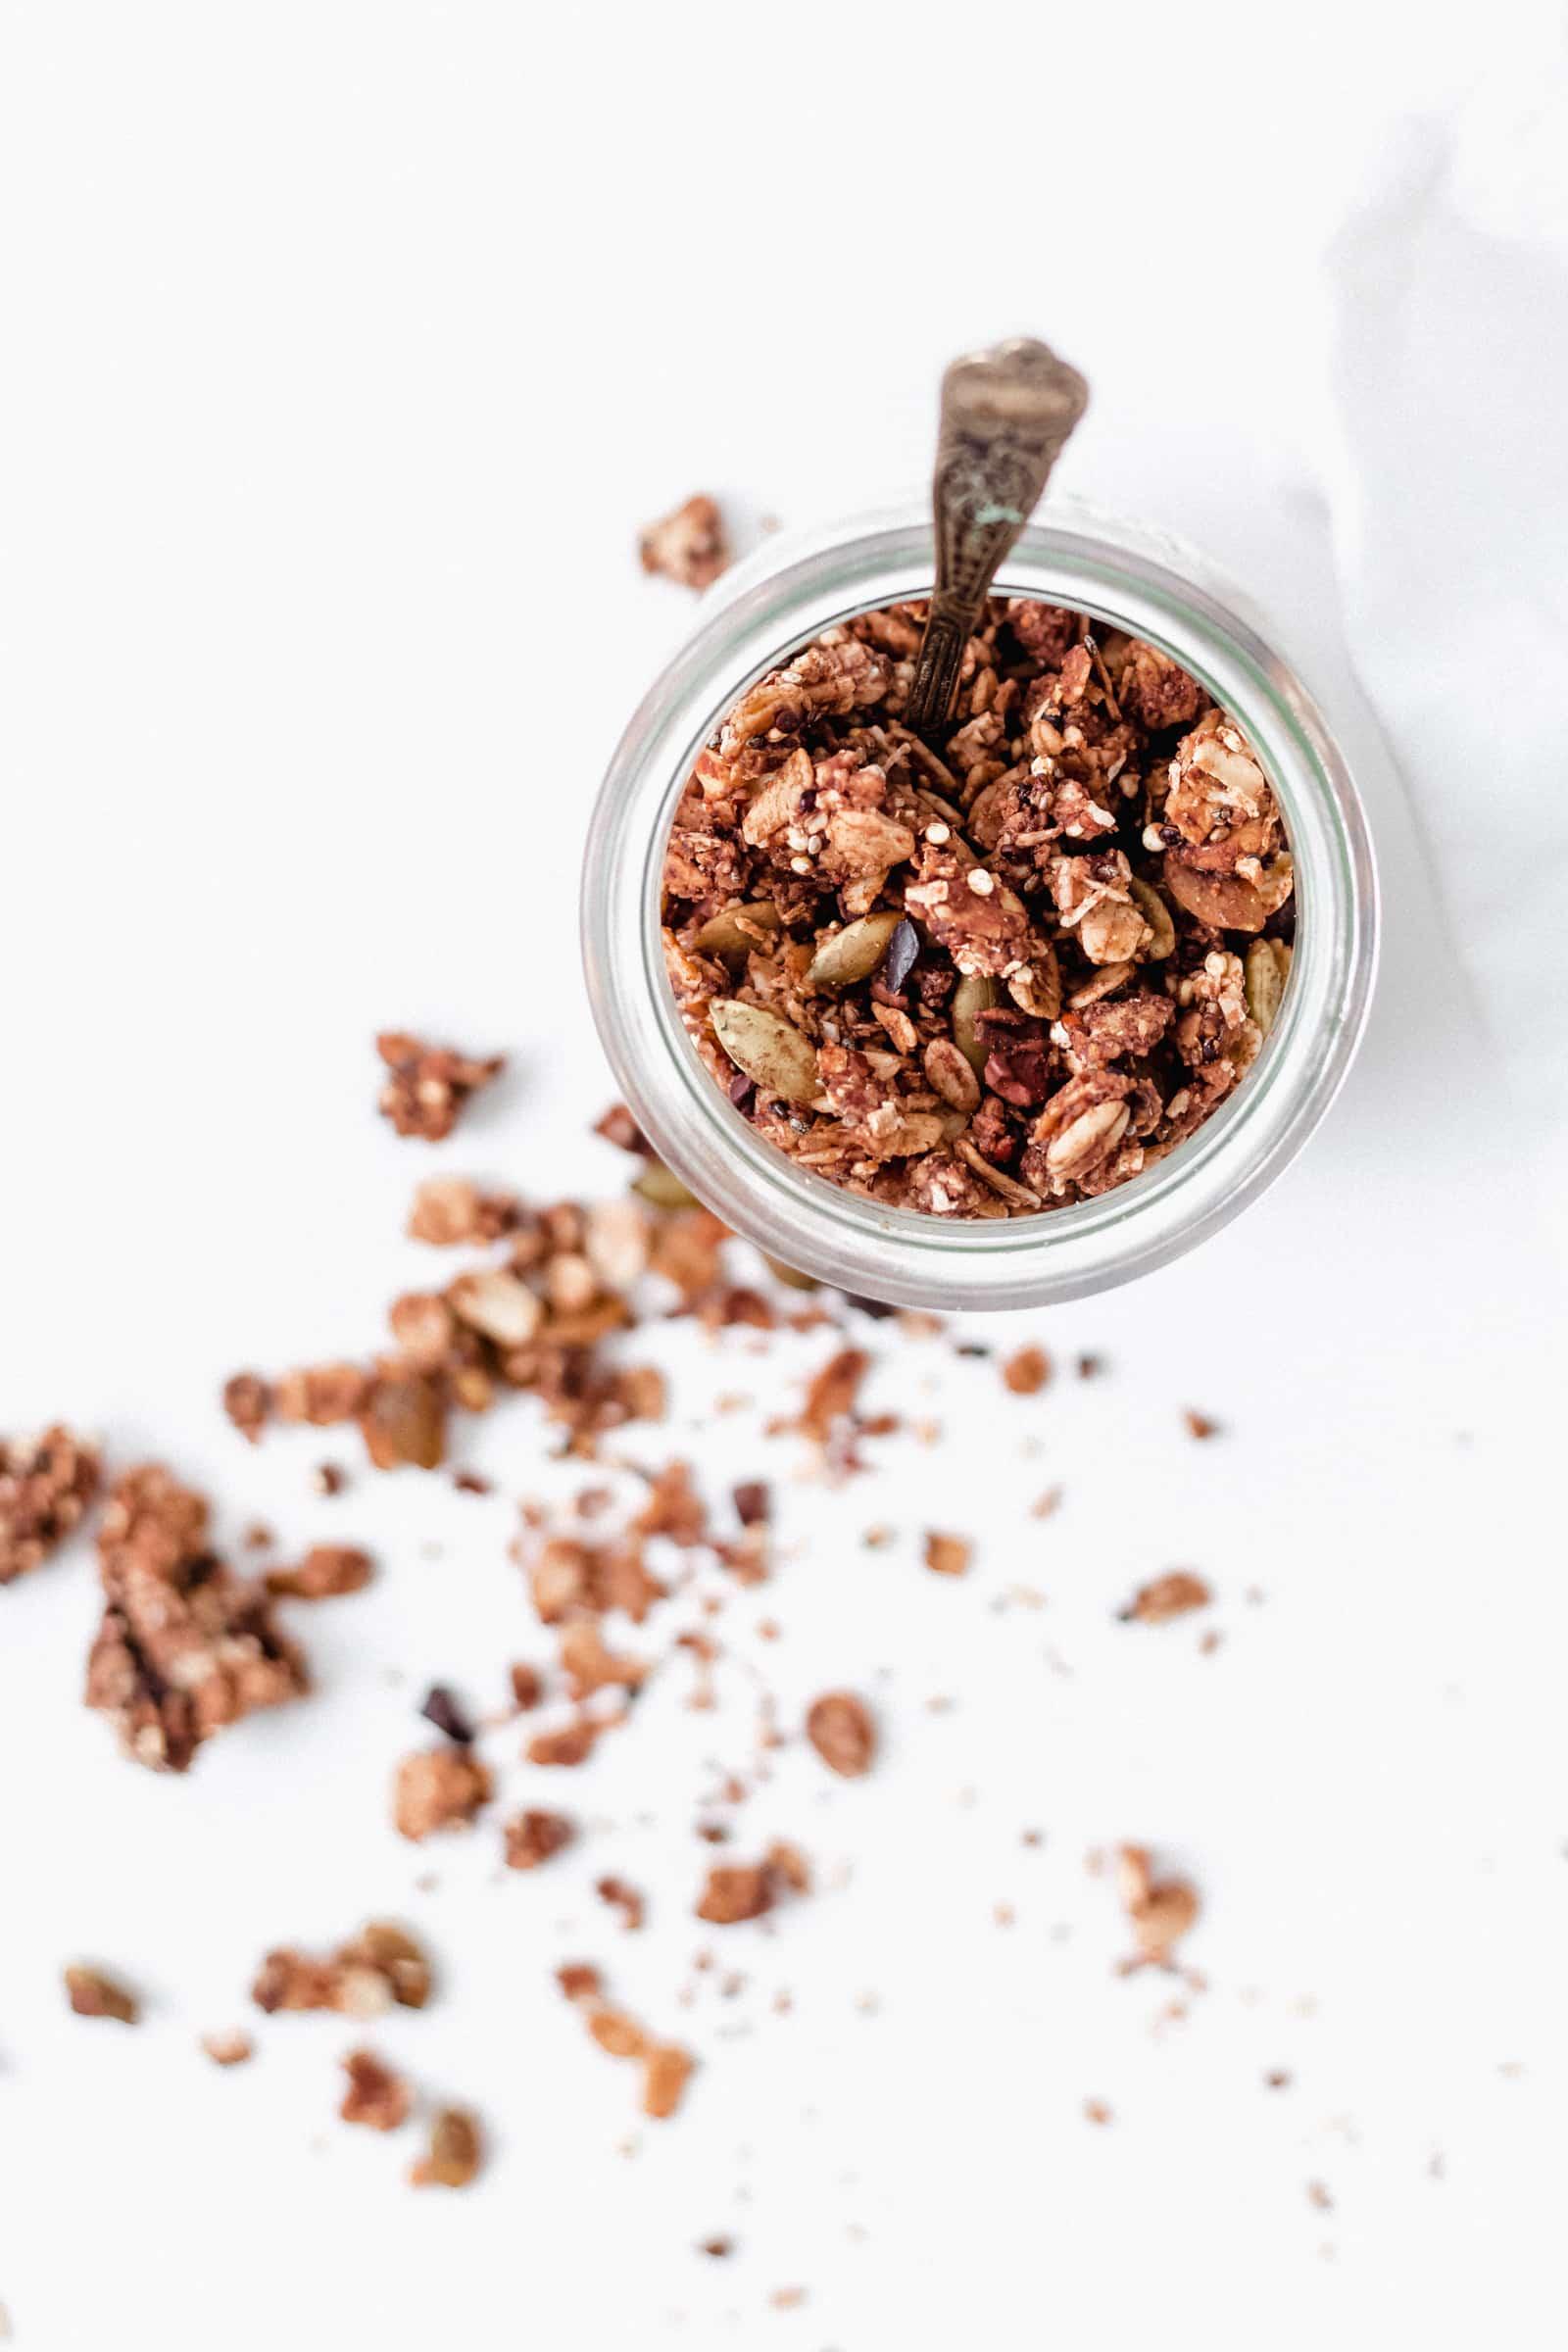 Superfood Chocolate Espresso Granola Recipe